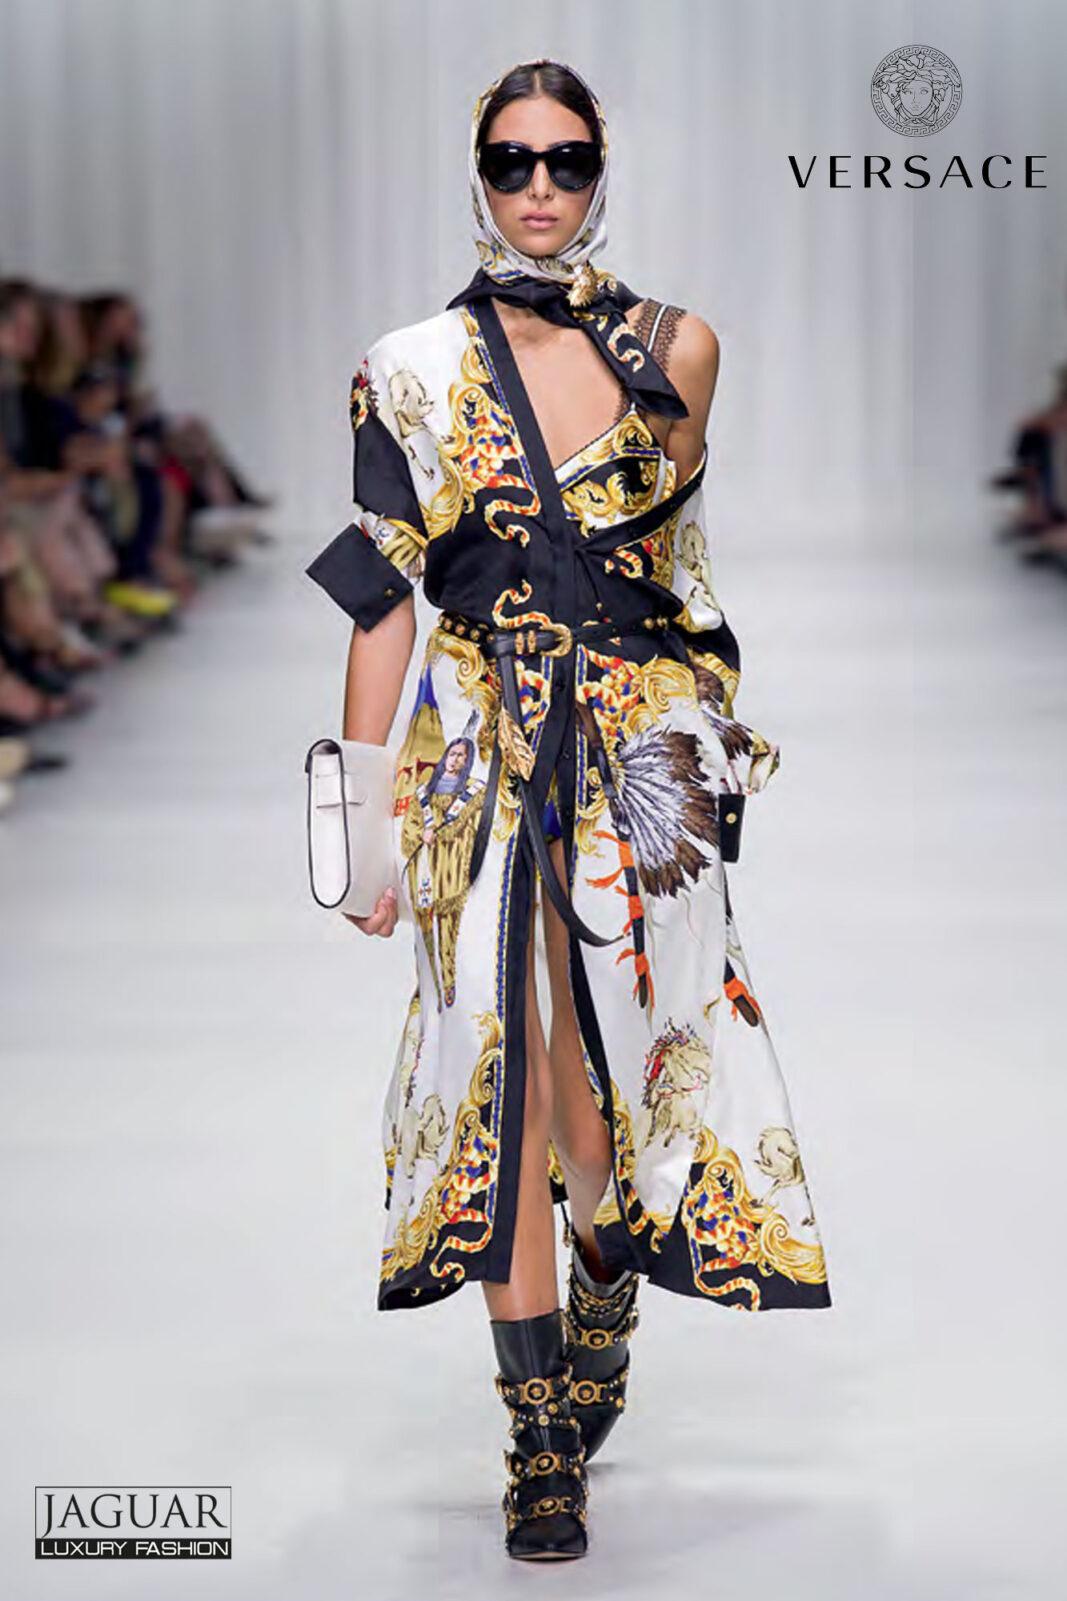 Versace Dress Black Print Jaguar Mode